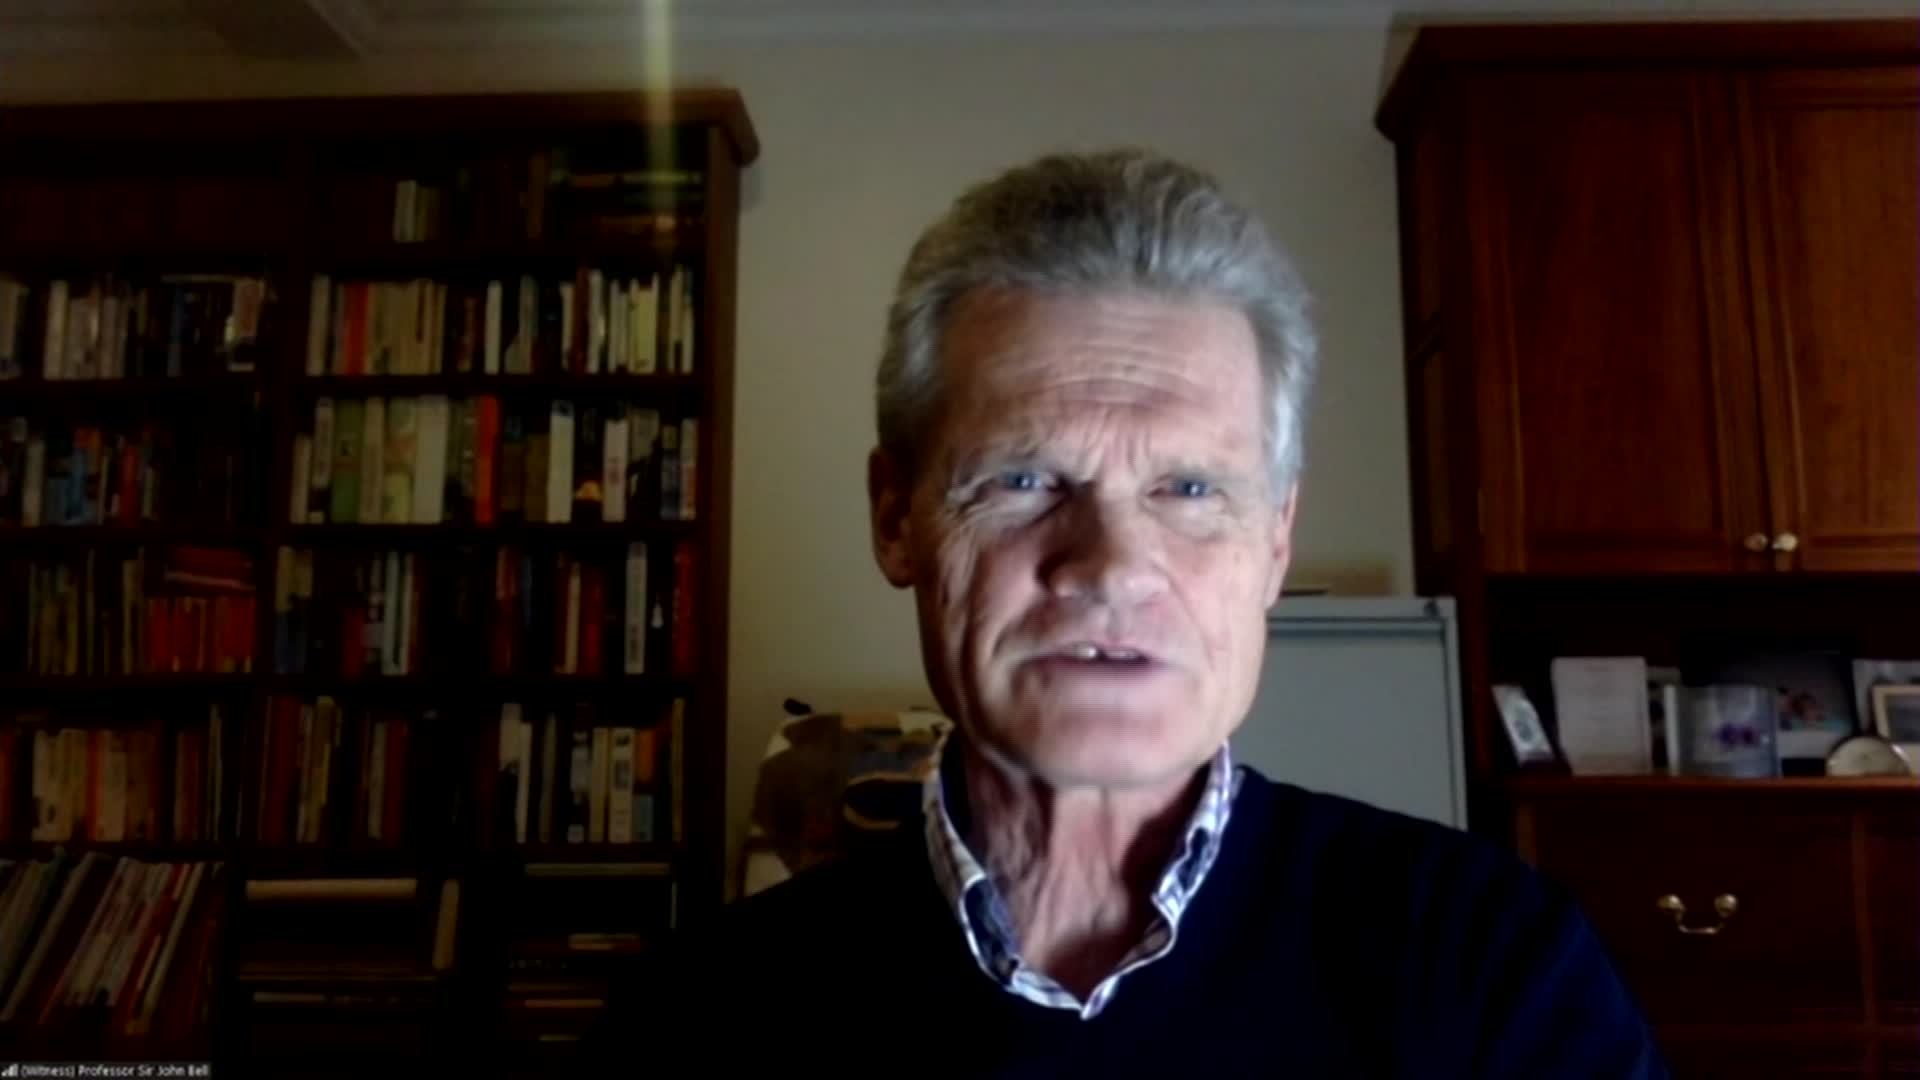 Regius Professor of Medicine at Oxford University John Bell speaks during a parliamentary committee hearing on November 10.